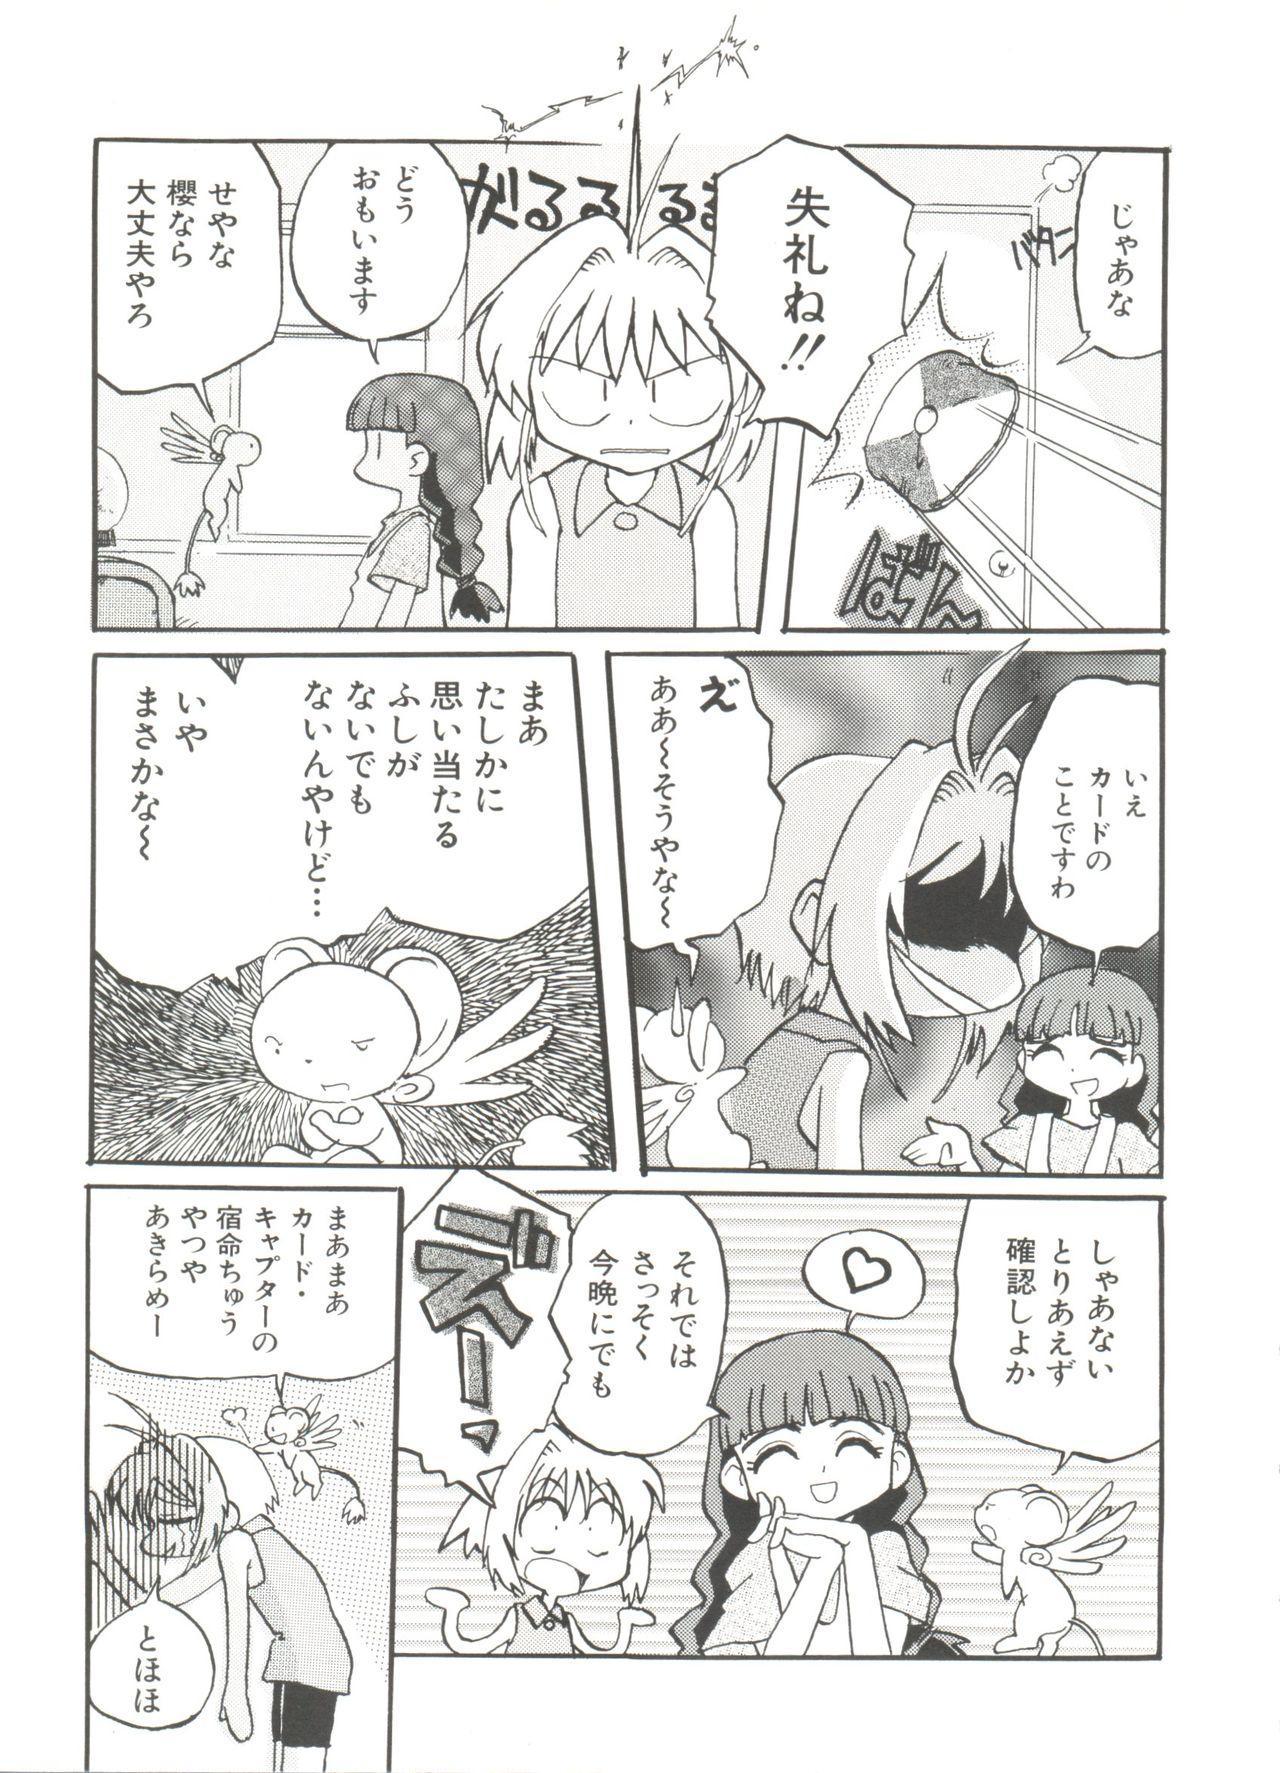 [Anthology] Denei Tamatebako 8 - Utakata no Tenshi-tachi II (Various) 102